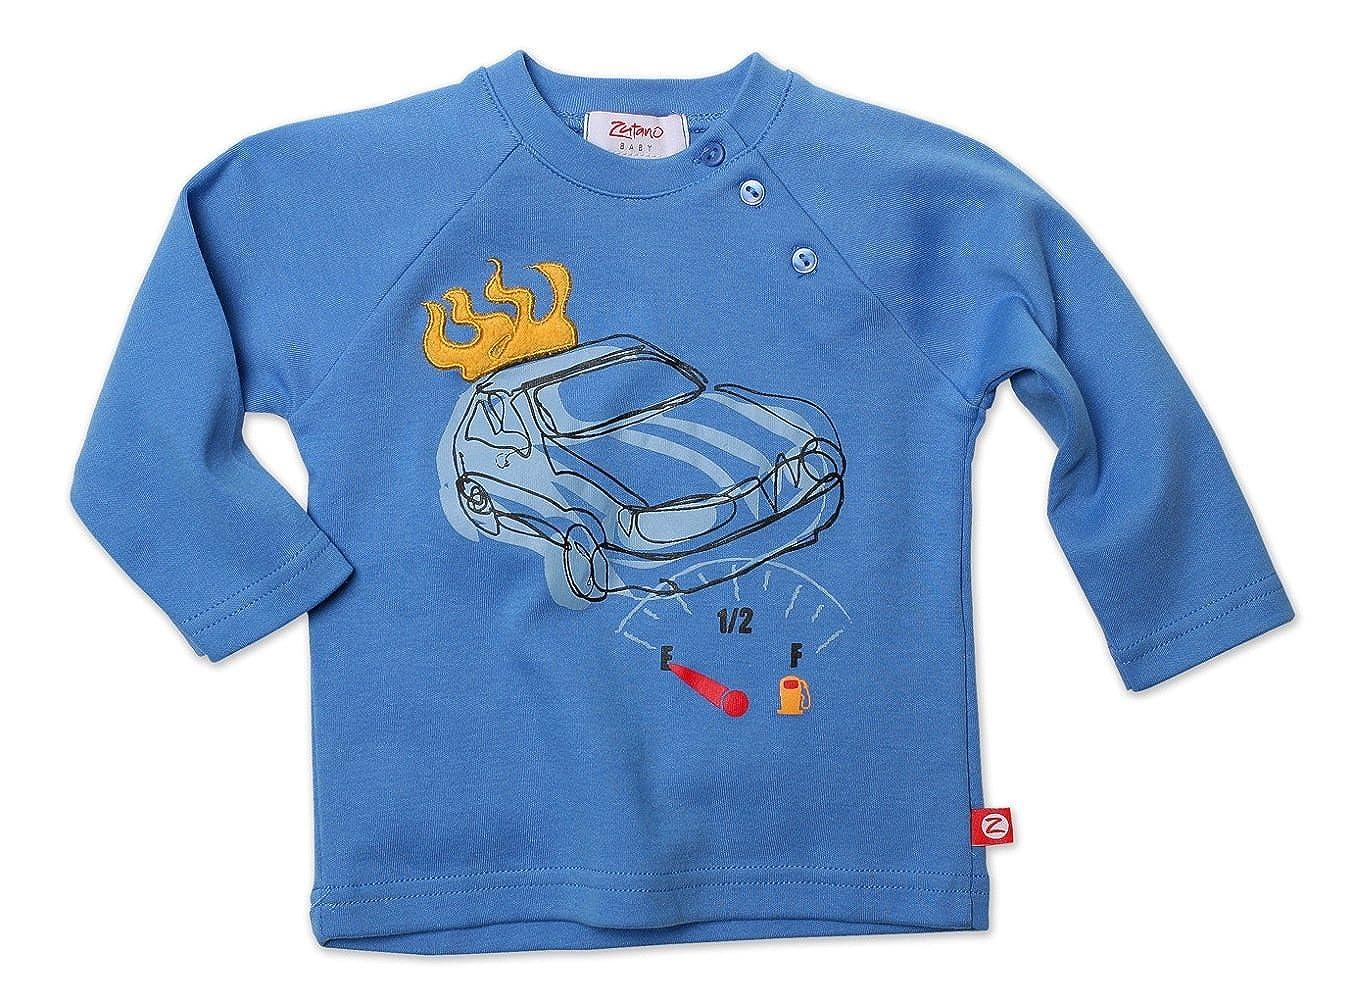 Zutano Baby Boys Motorway Applique Raglan Long//Sleeve Tee